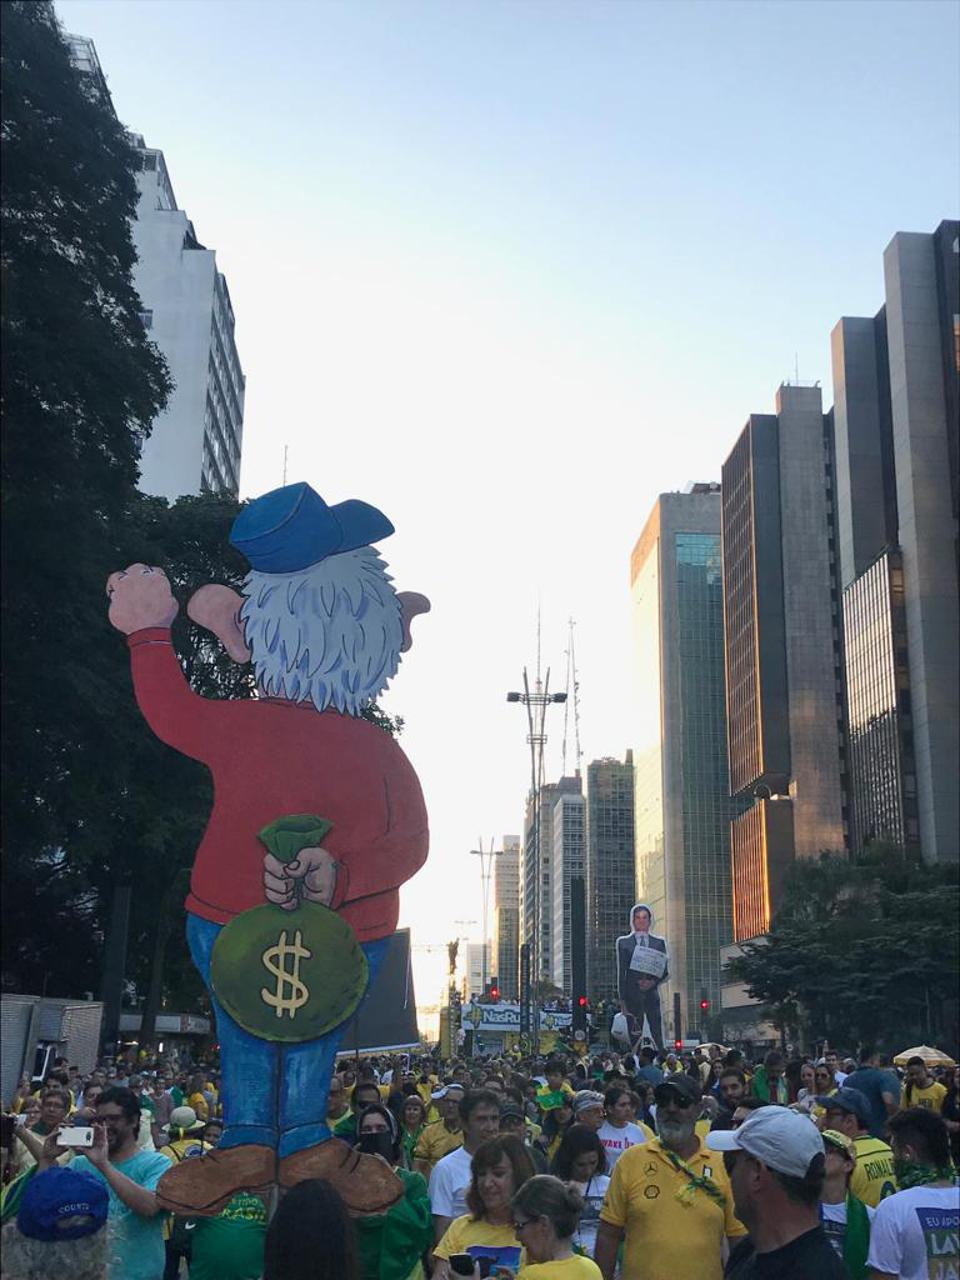 Ursula Castelloti's picture of June 30 protests along Ave Paulista